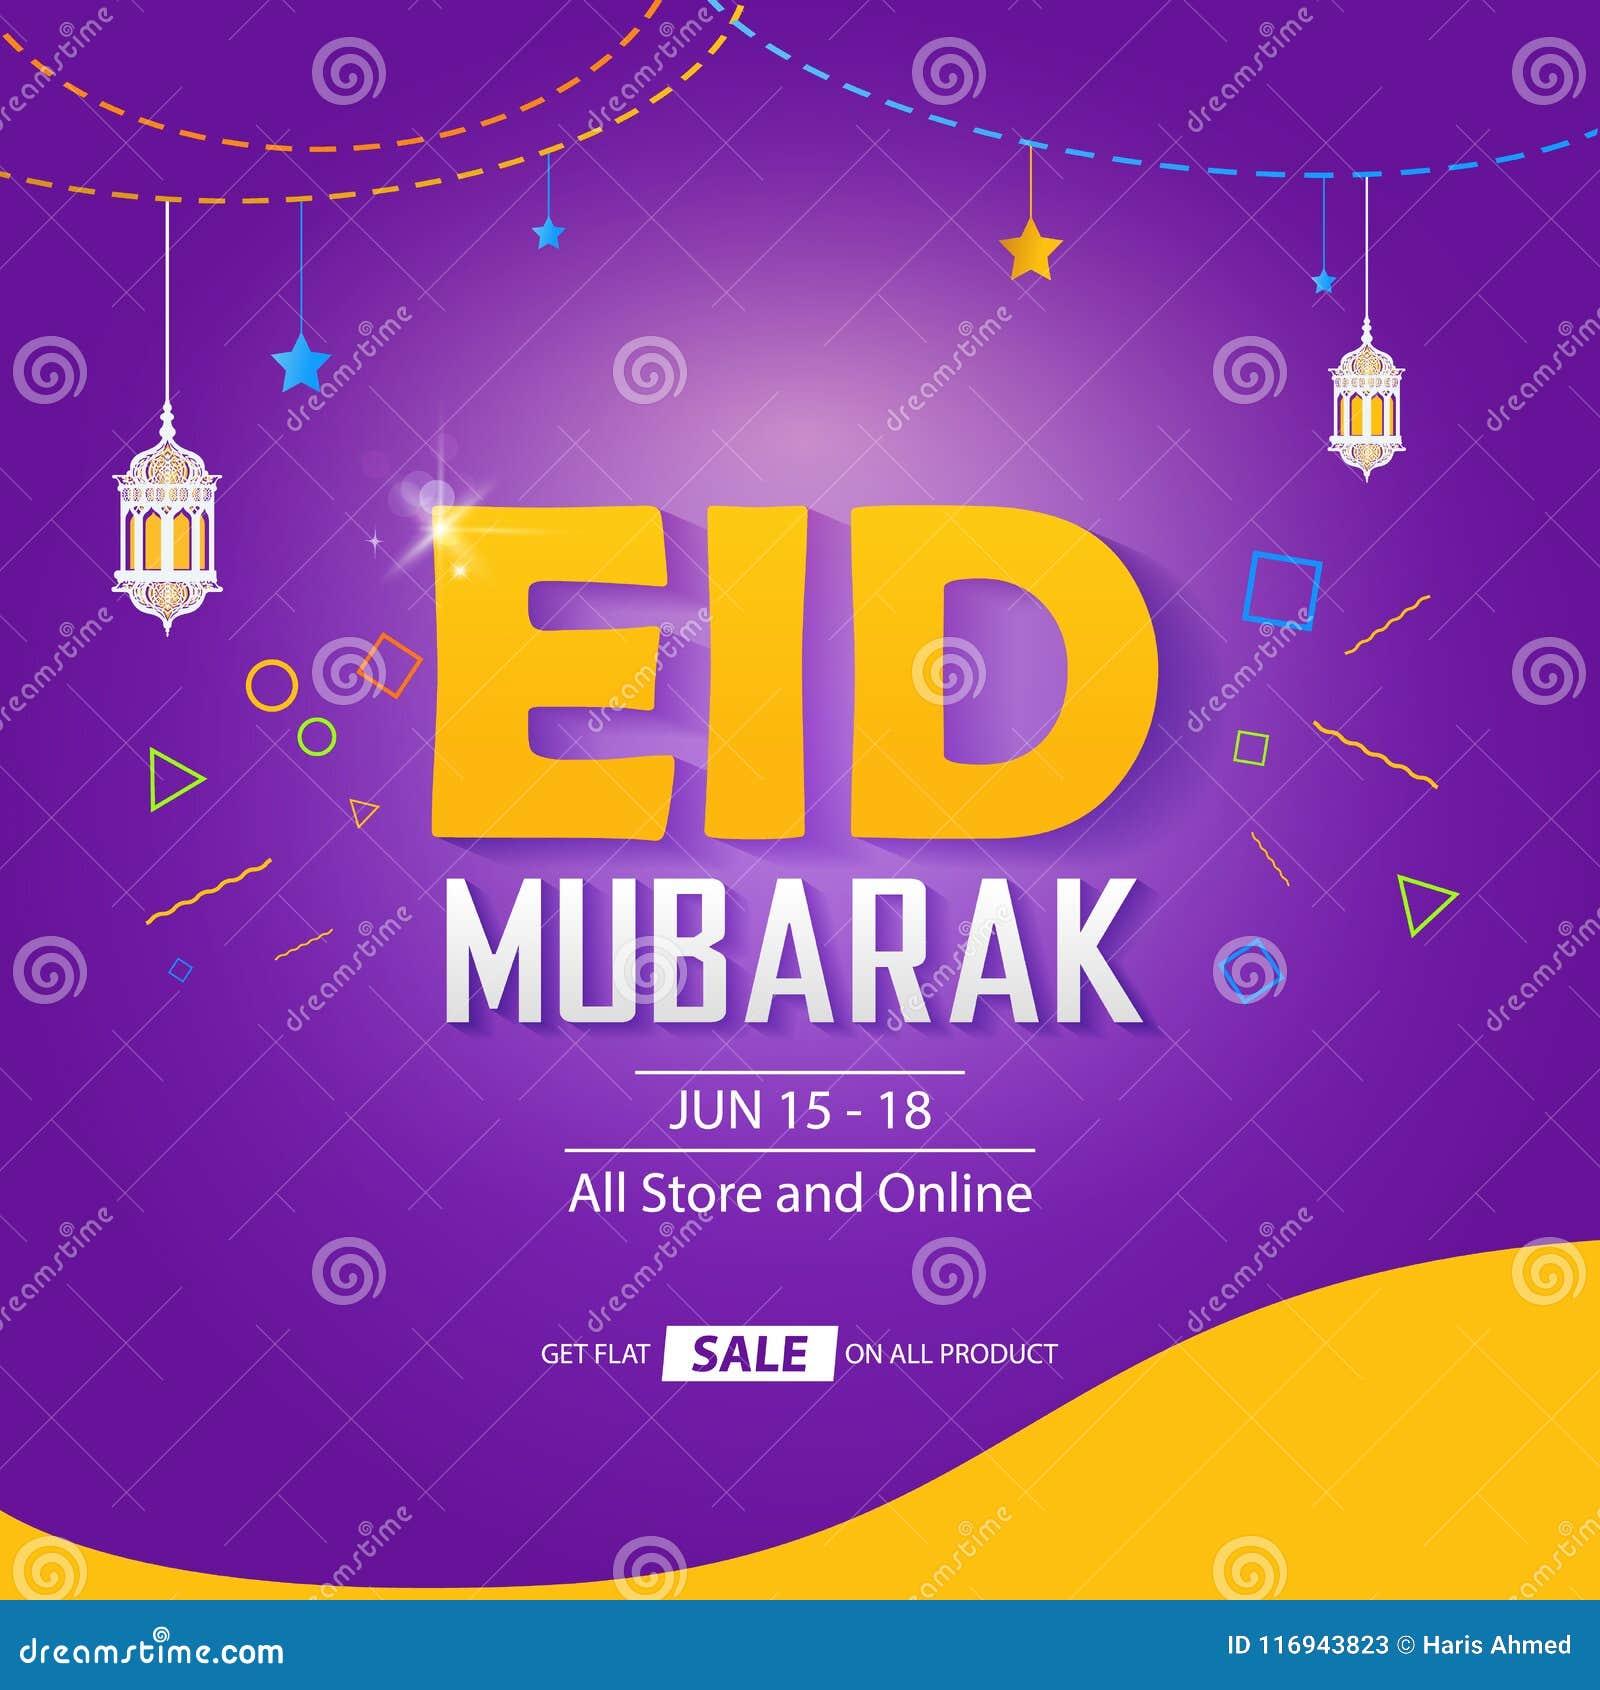 Eid Mubarak Eid Sale Banner Cover Concept Template Design Stock Vector Illustration Of Islam Cover 116943823